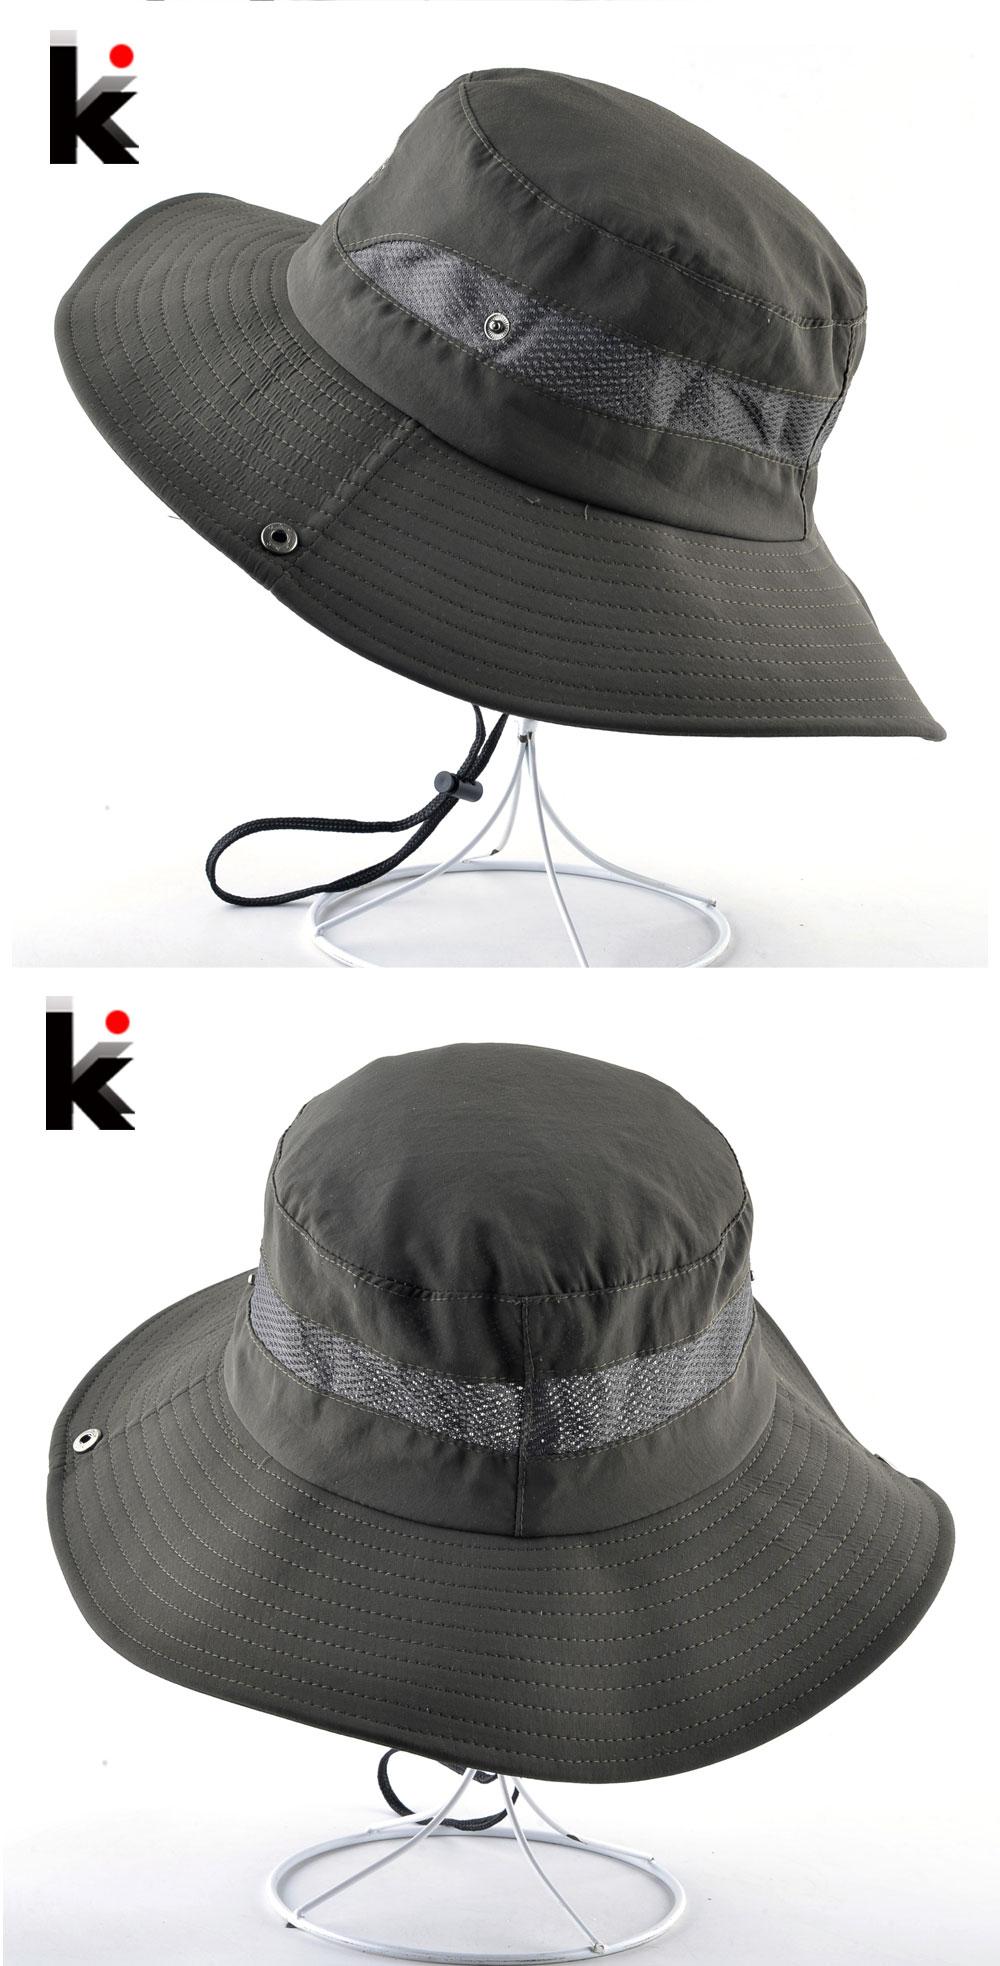 25381597 Wide Brim Bucket Hat Men Outdoor Breathable mesh Waterproof Sun Cap Solid  Color Sprot Hat Climbing Hiking UV Protection HatsUSD 8.21/piece